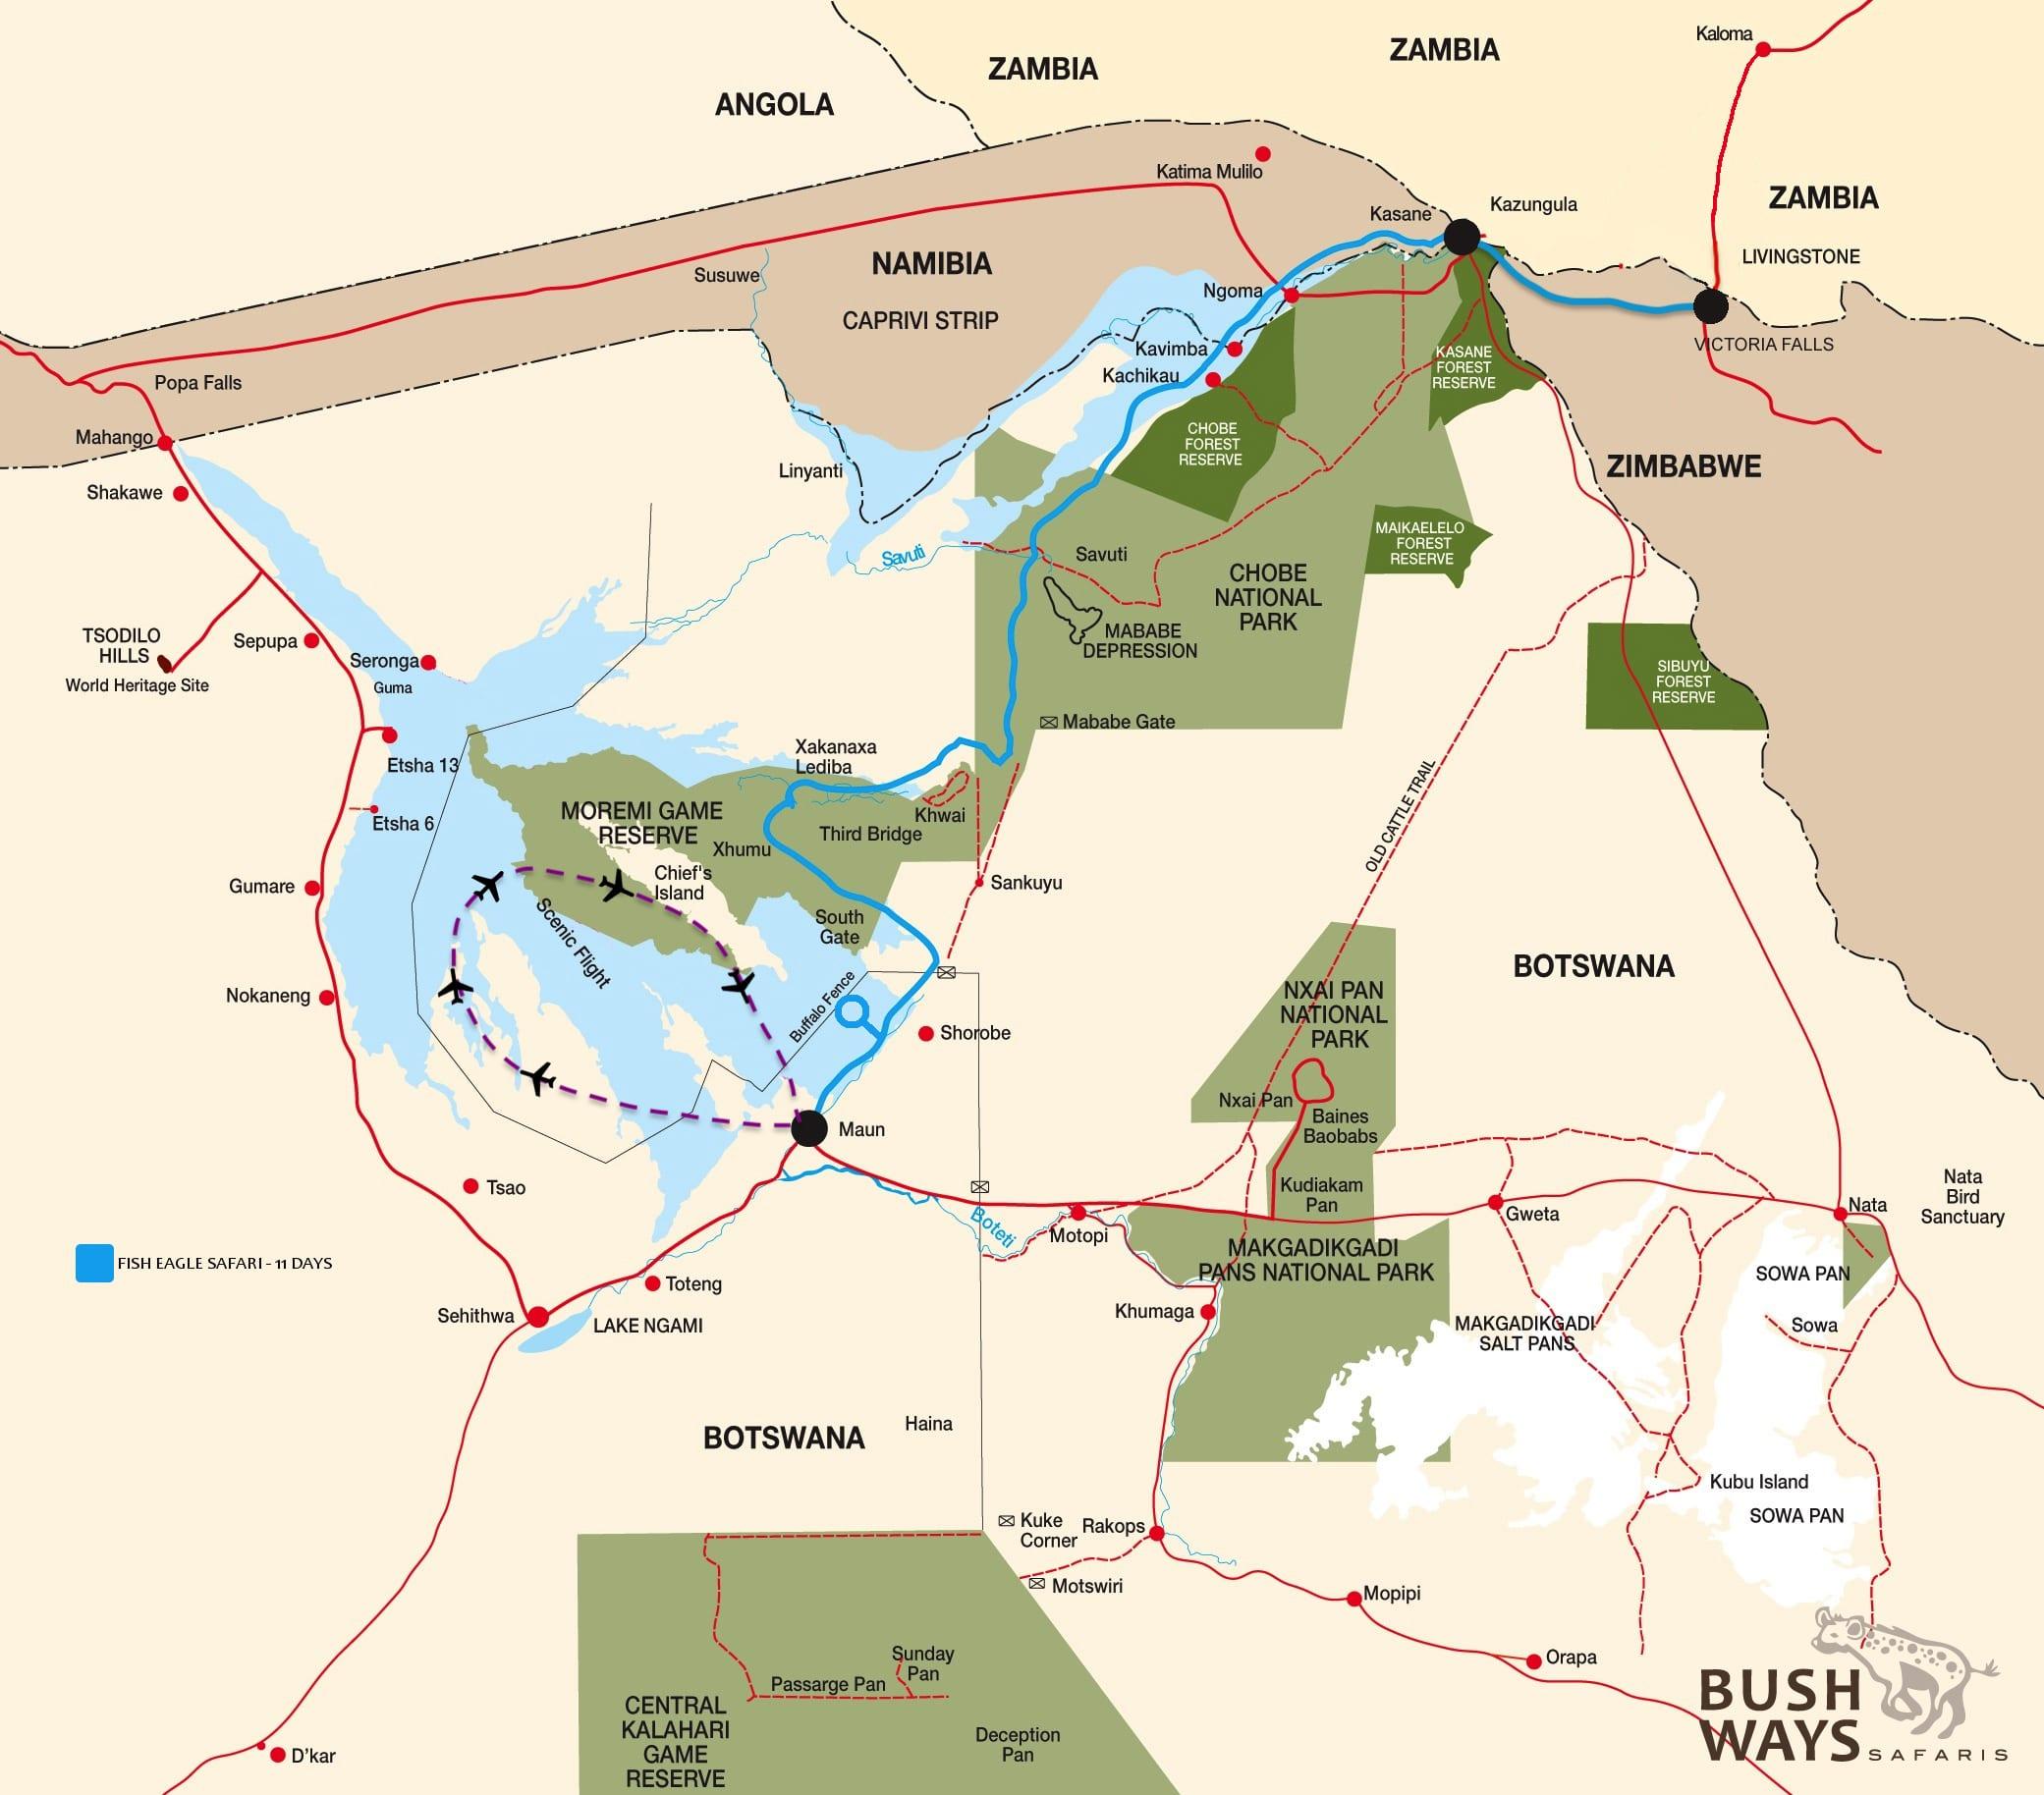 MAP - Bushways Map fisheagle19 - BW 5